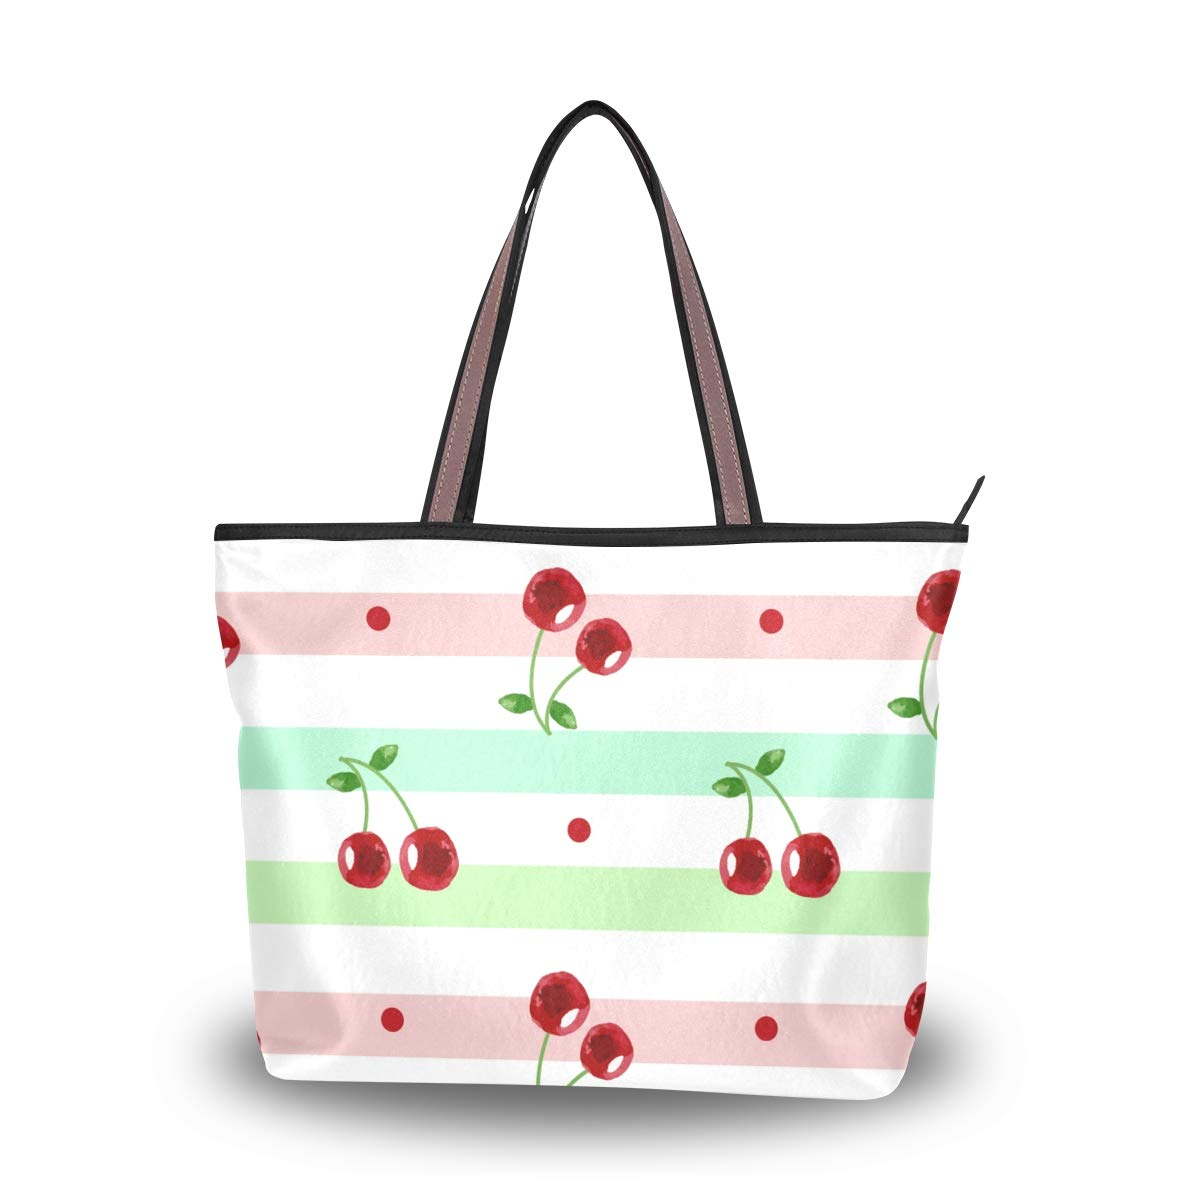 FRUIT PUNCH STRIPED HANDBAG | GUESS.eu | Purses, bags, Bag